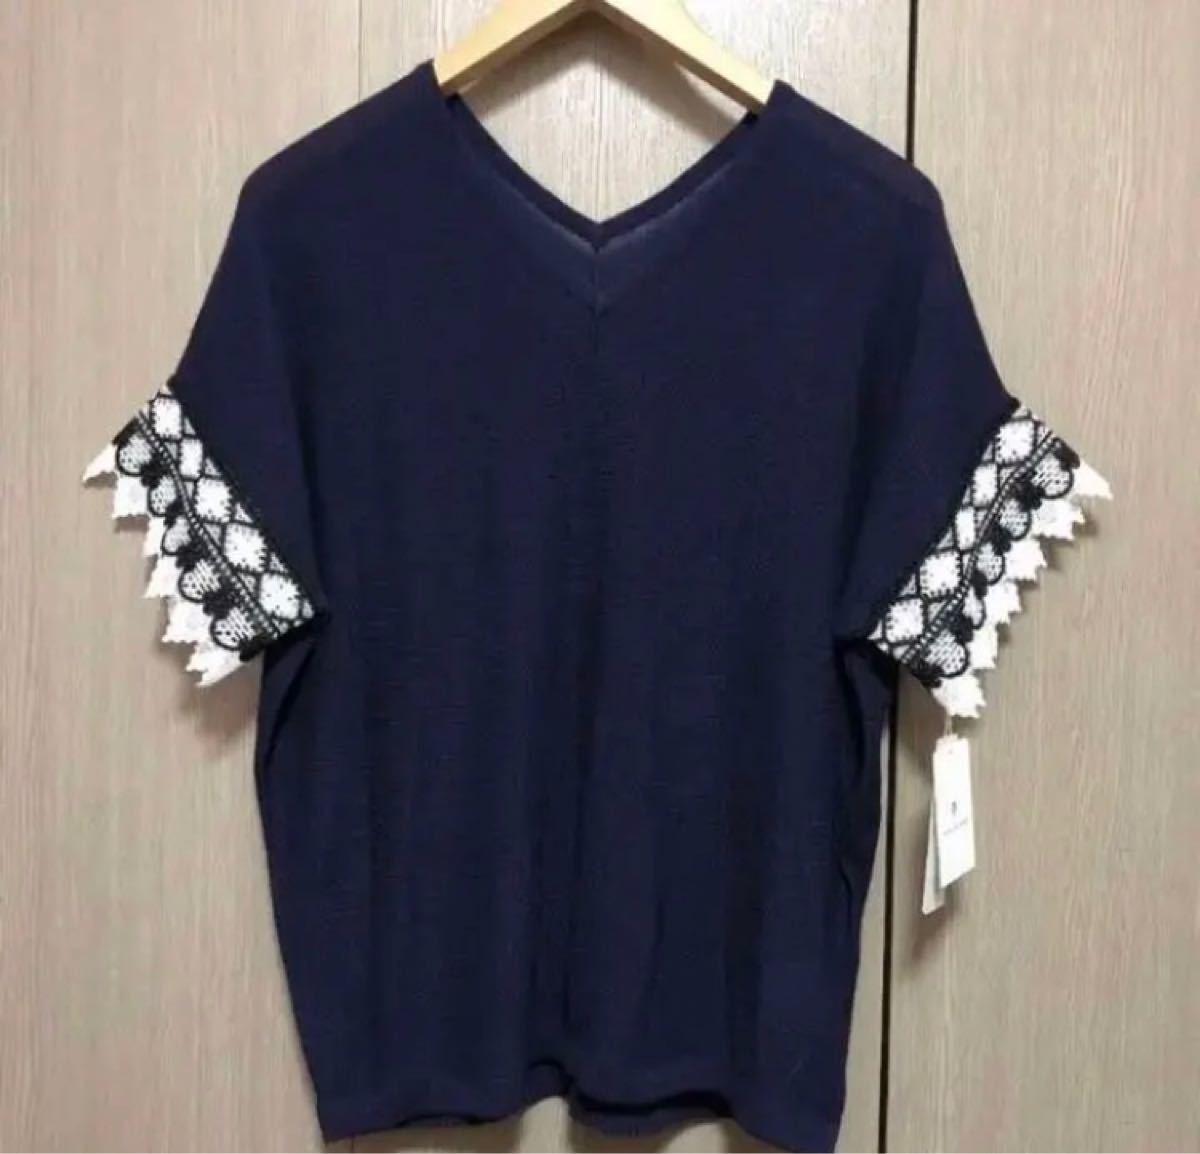 Tシャツ カットソー トップス ブージュルード 刺繍 ネイビー 新品 未使用半袖